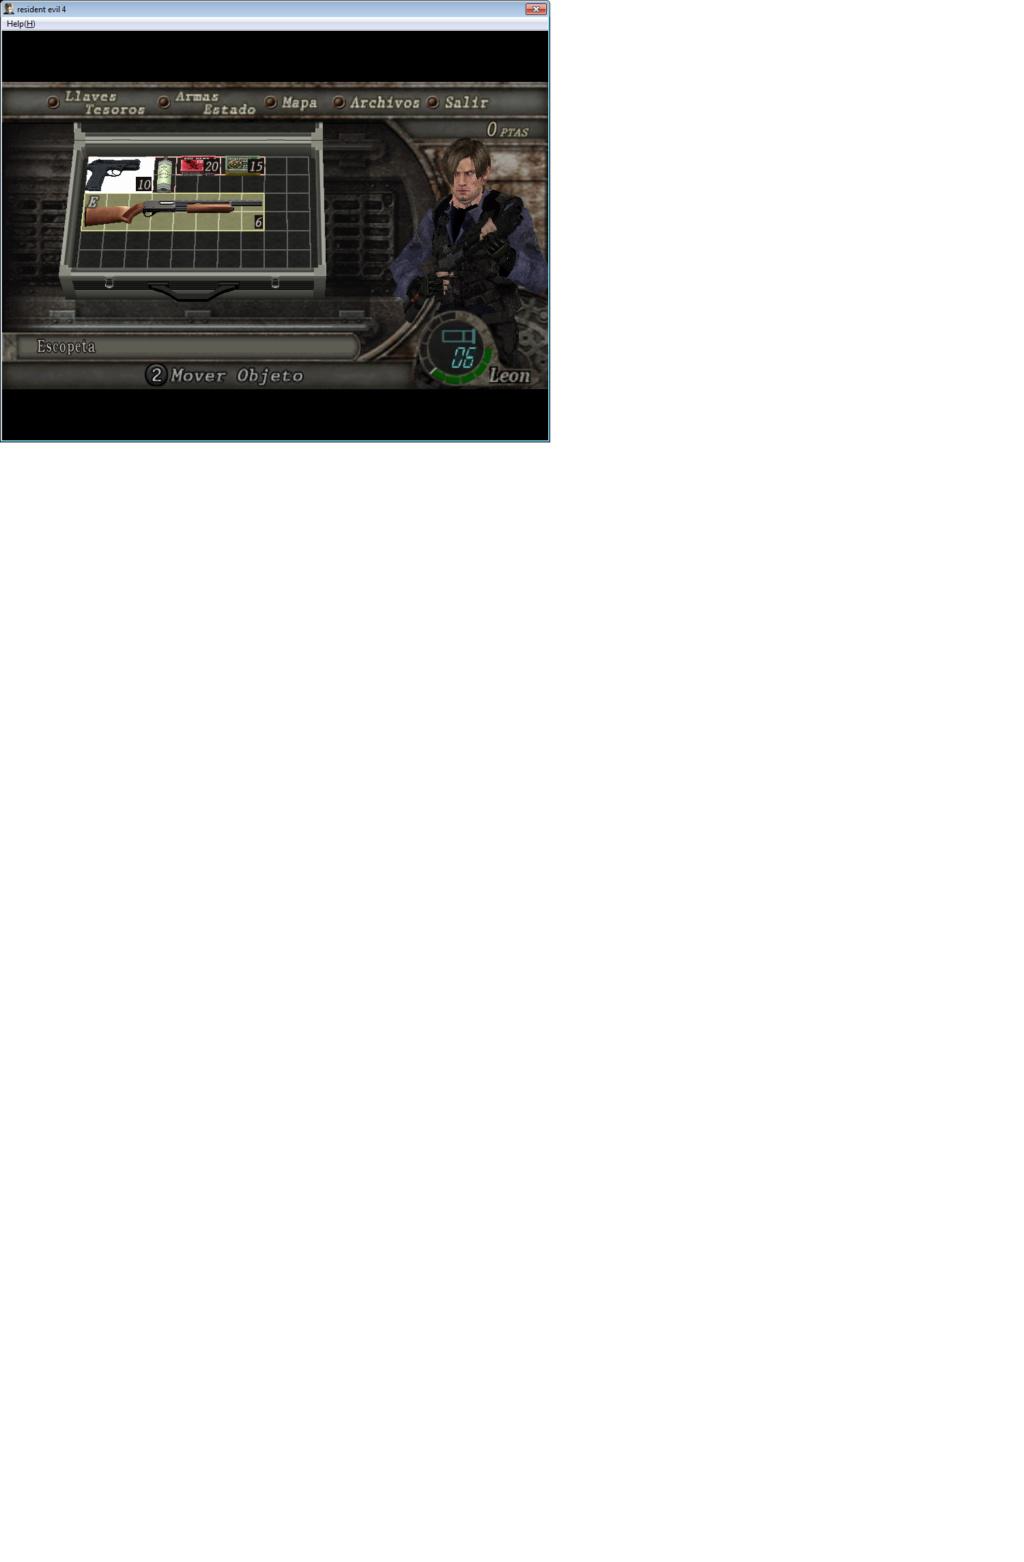 Super Mod de Resident evil 6 para Resident evil 4 y nuevo equipo Captur11